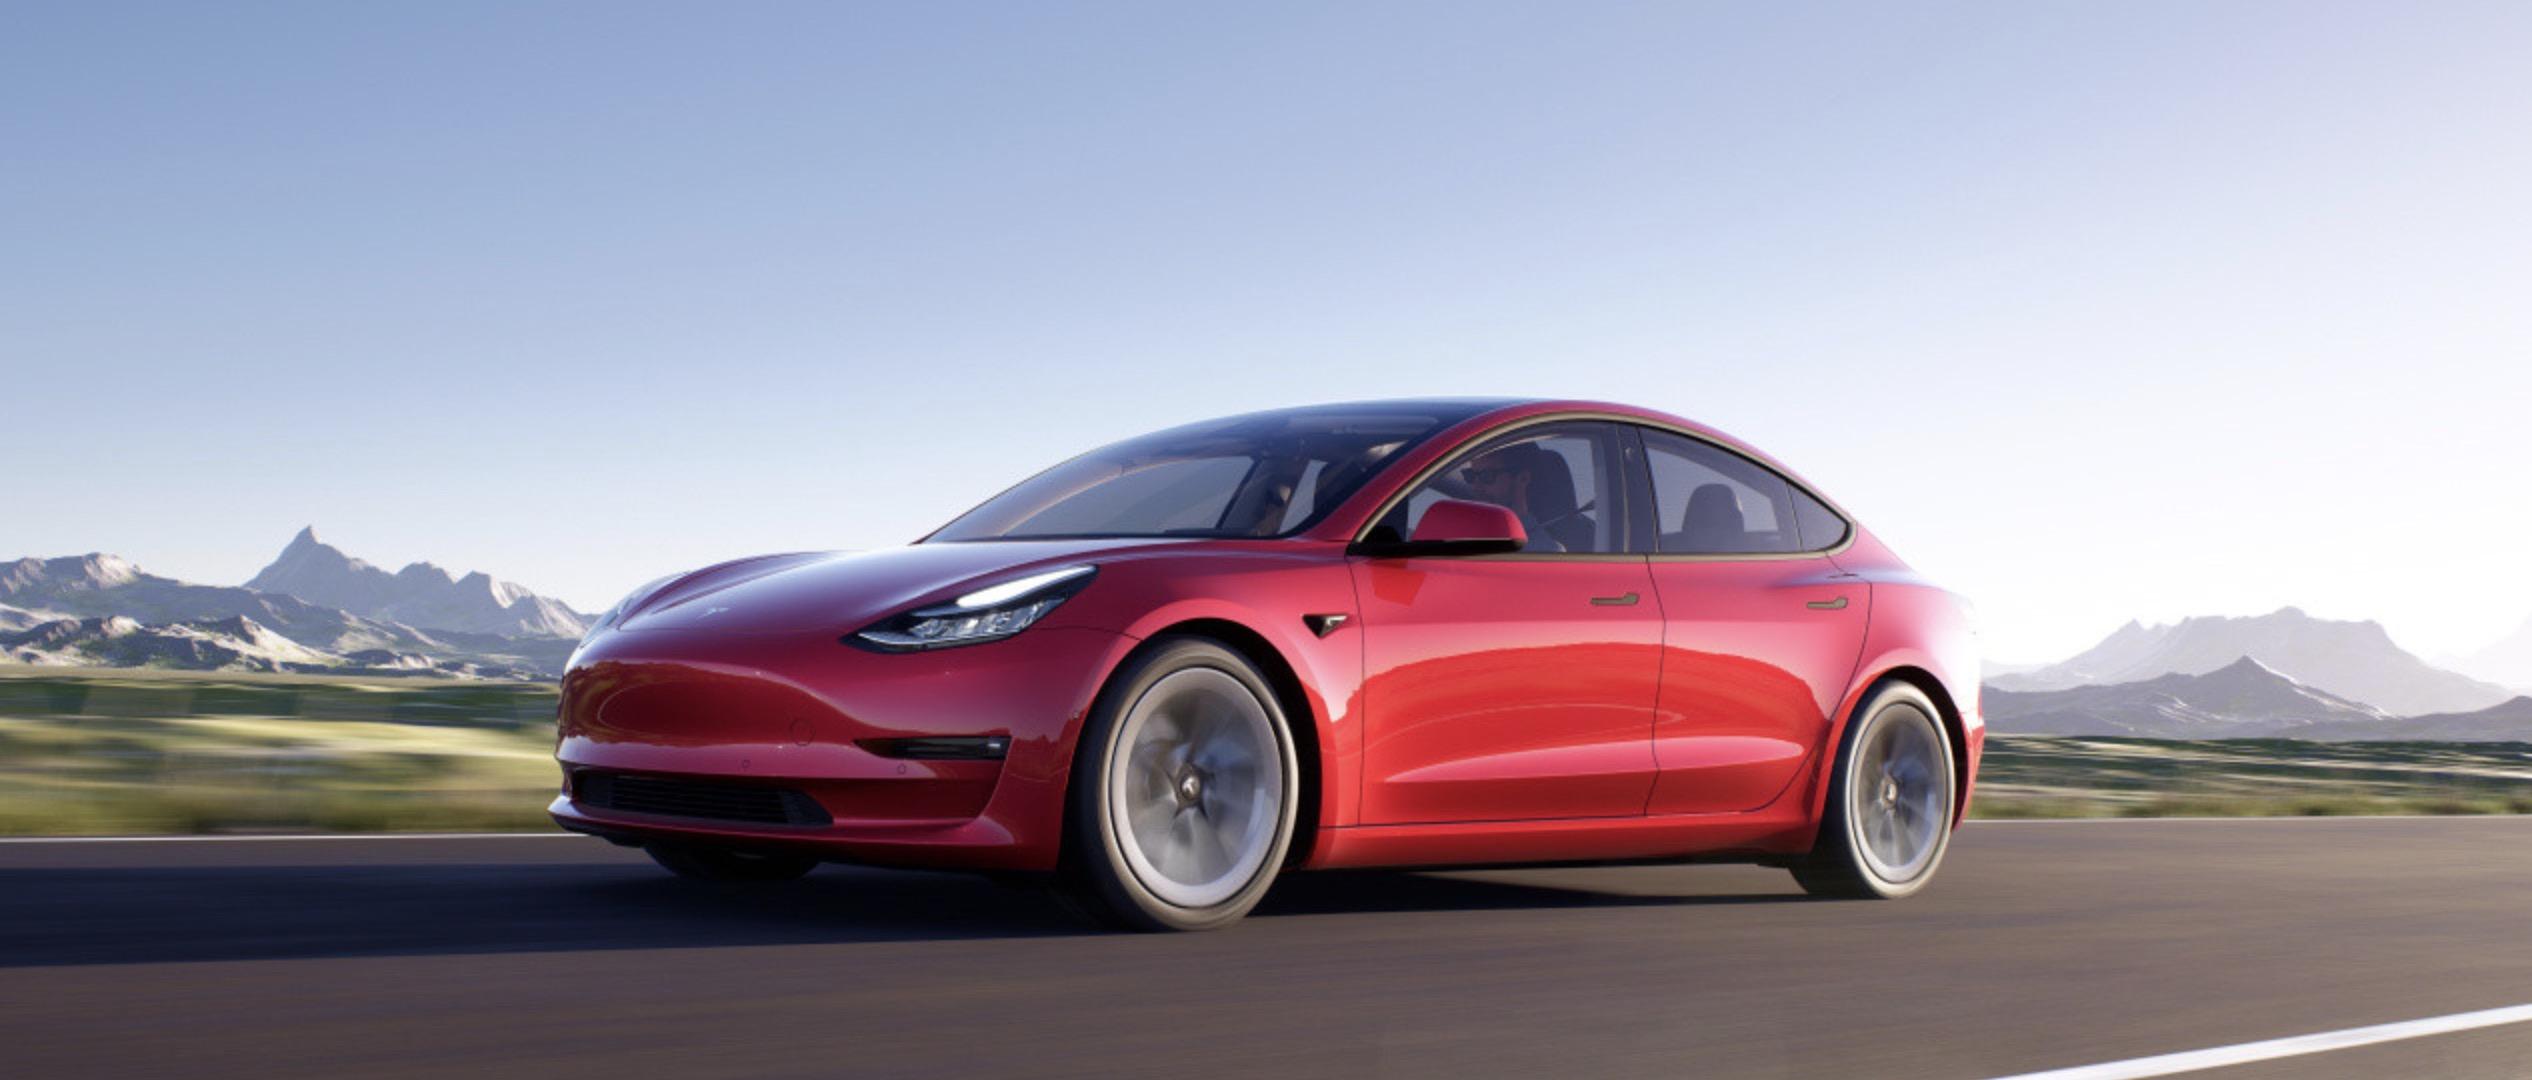 Tesla Model 3 2021 refresh jpg?quality=82&strip=all.'